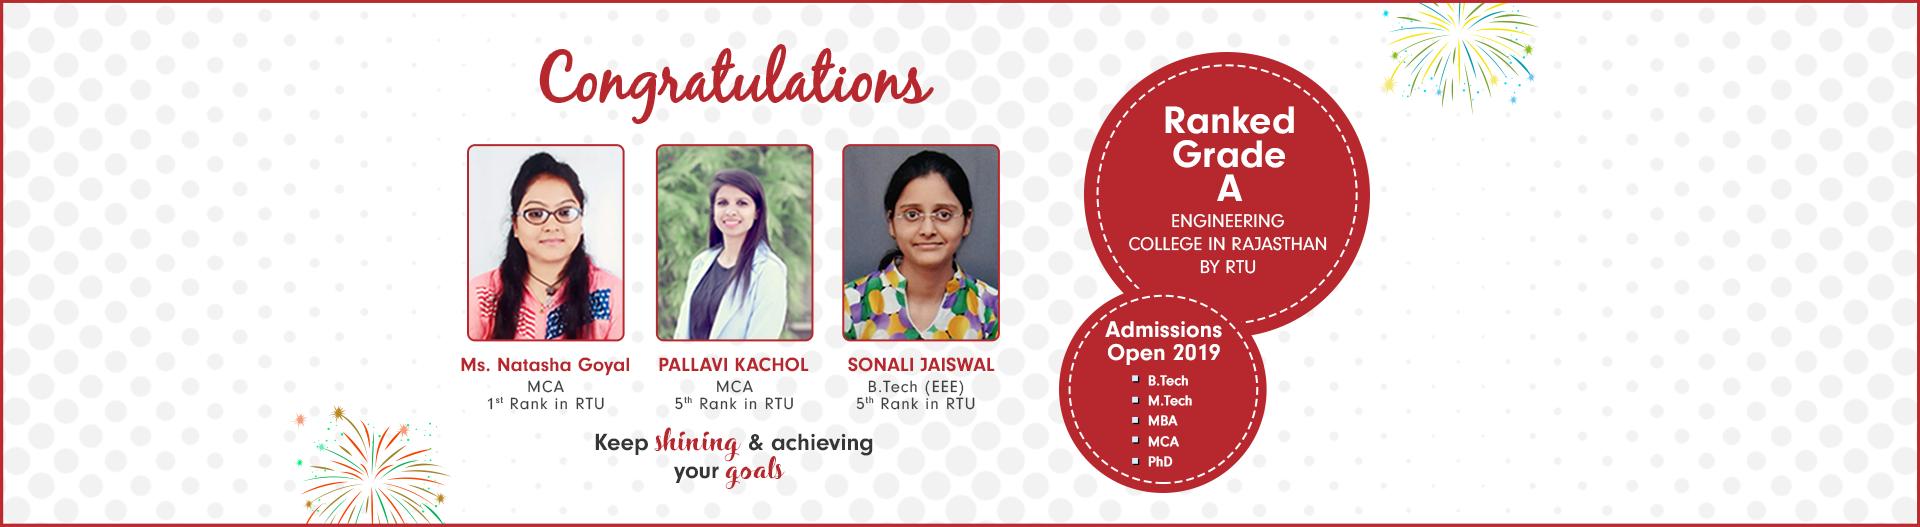 Top College in Jaipur for Engineering | Best Private Engineering